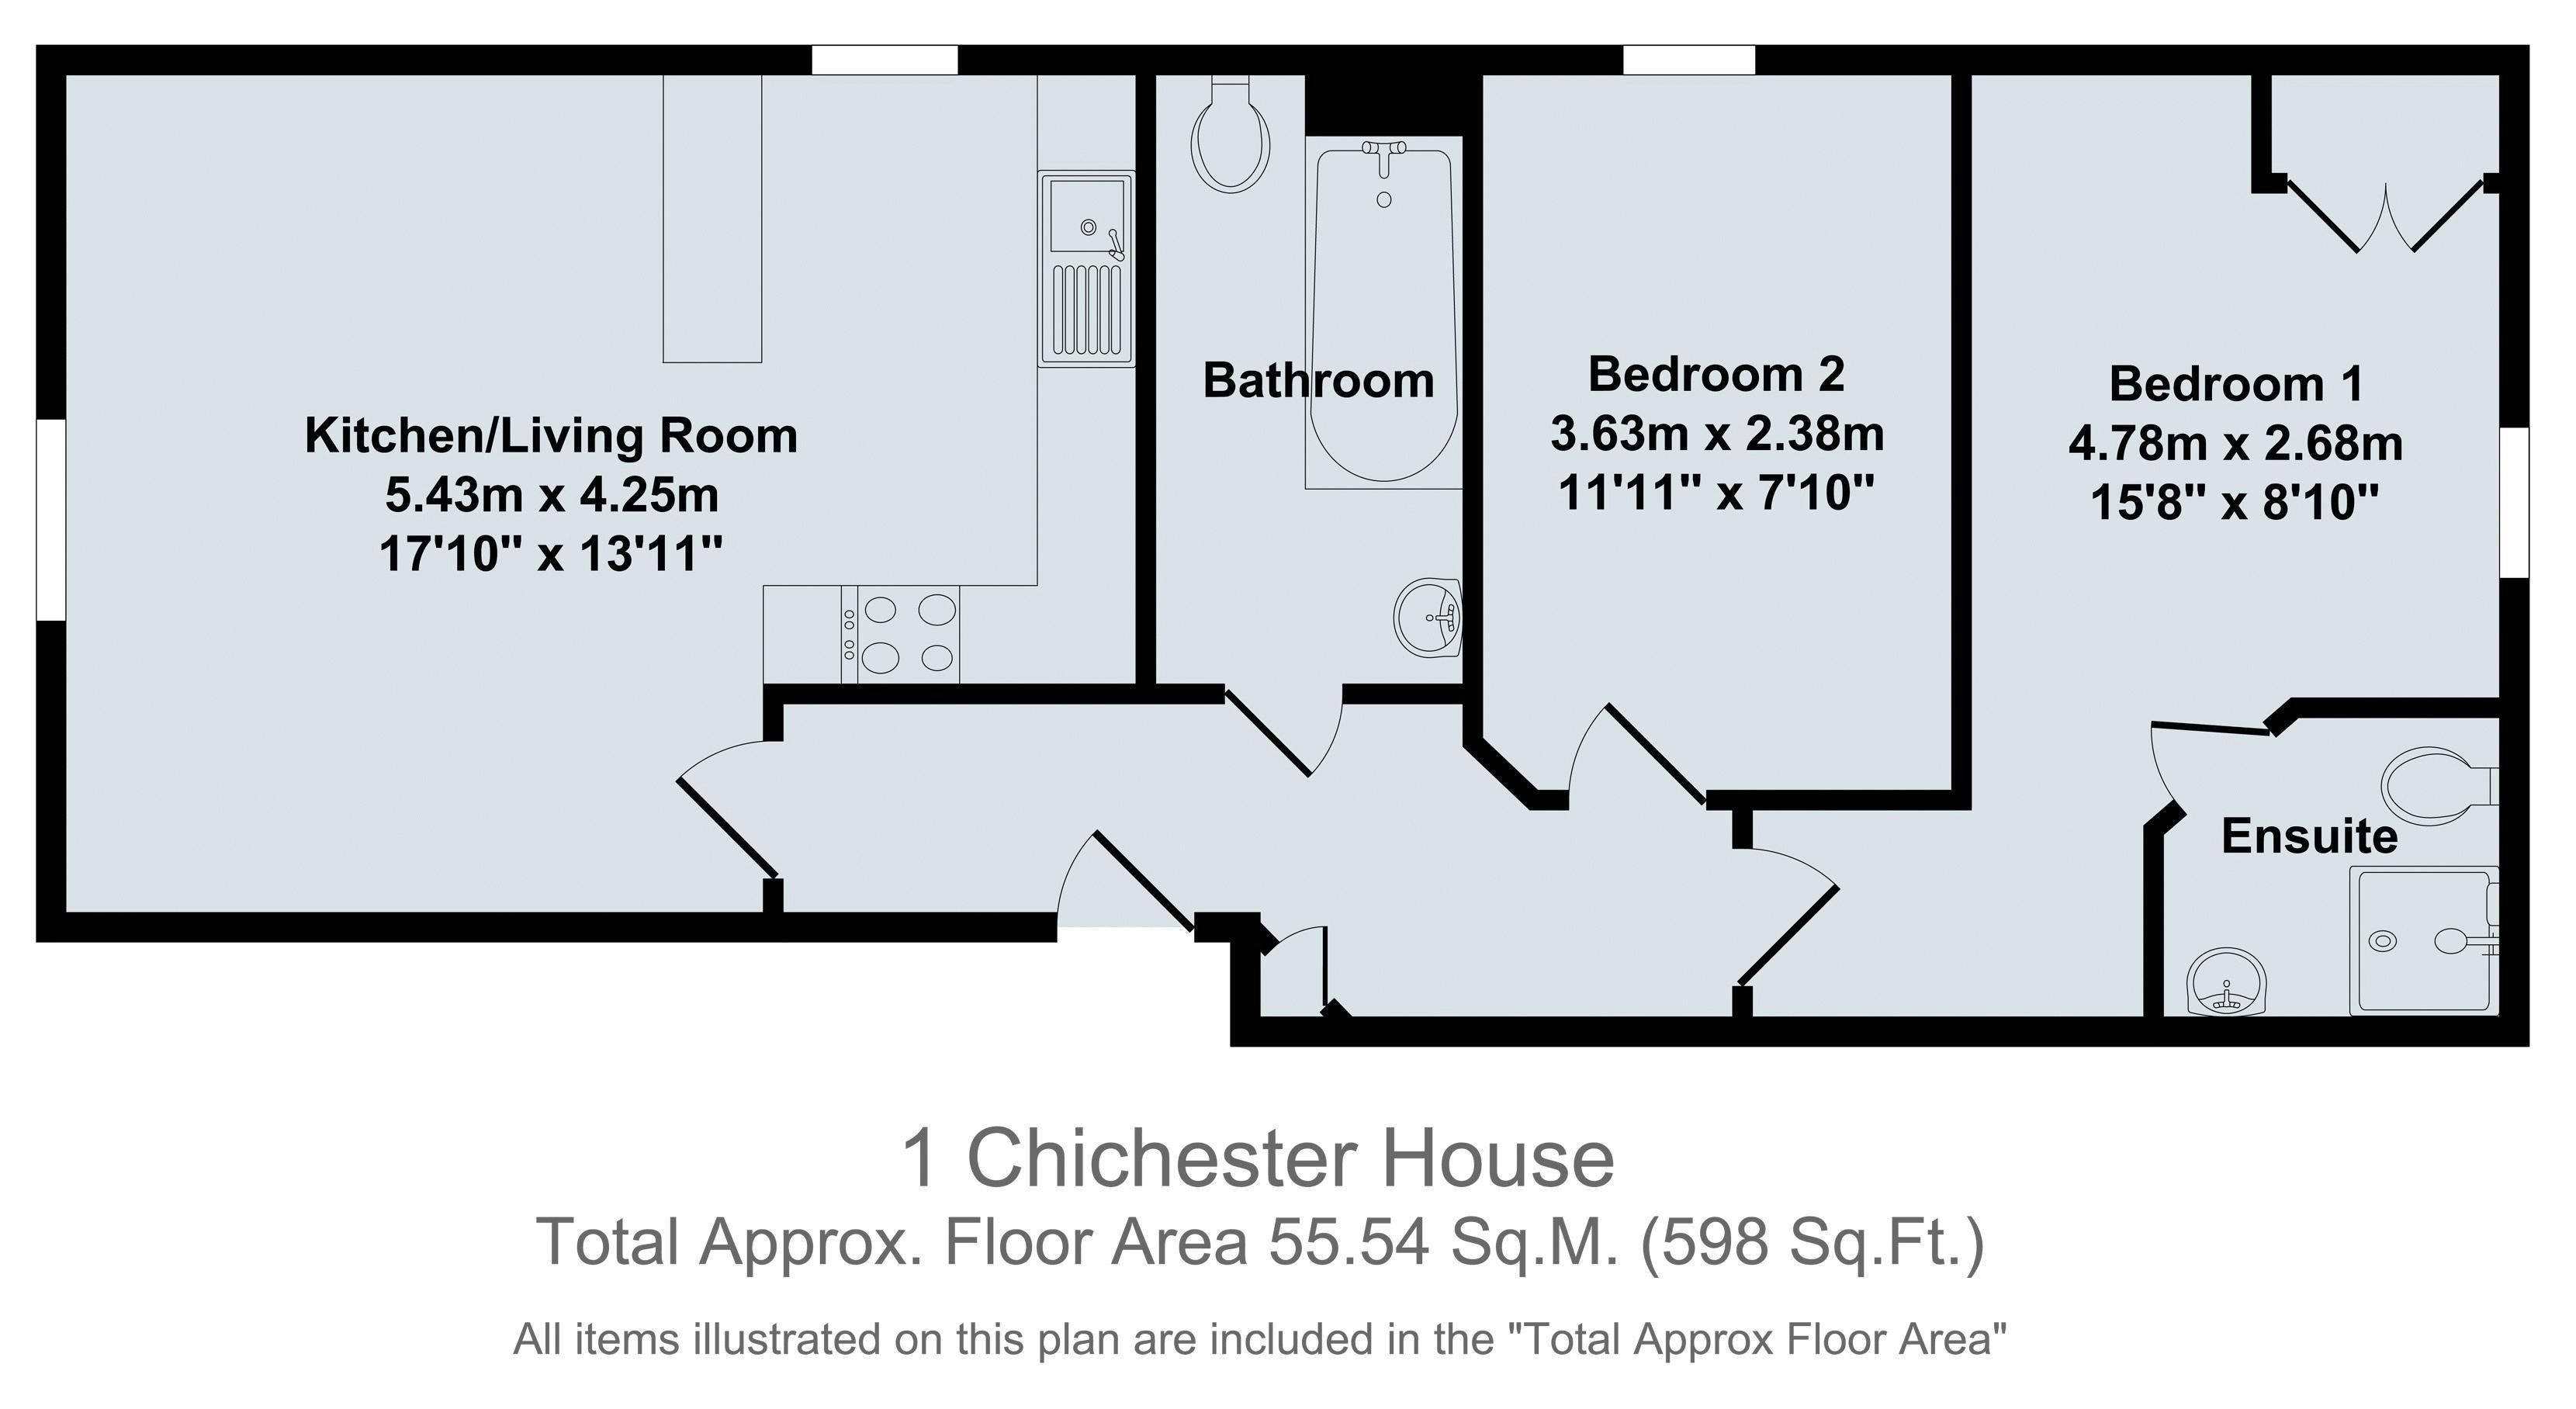 Chichester House, Woodgreen